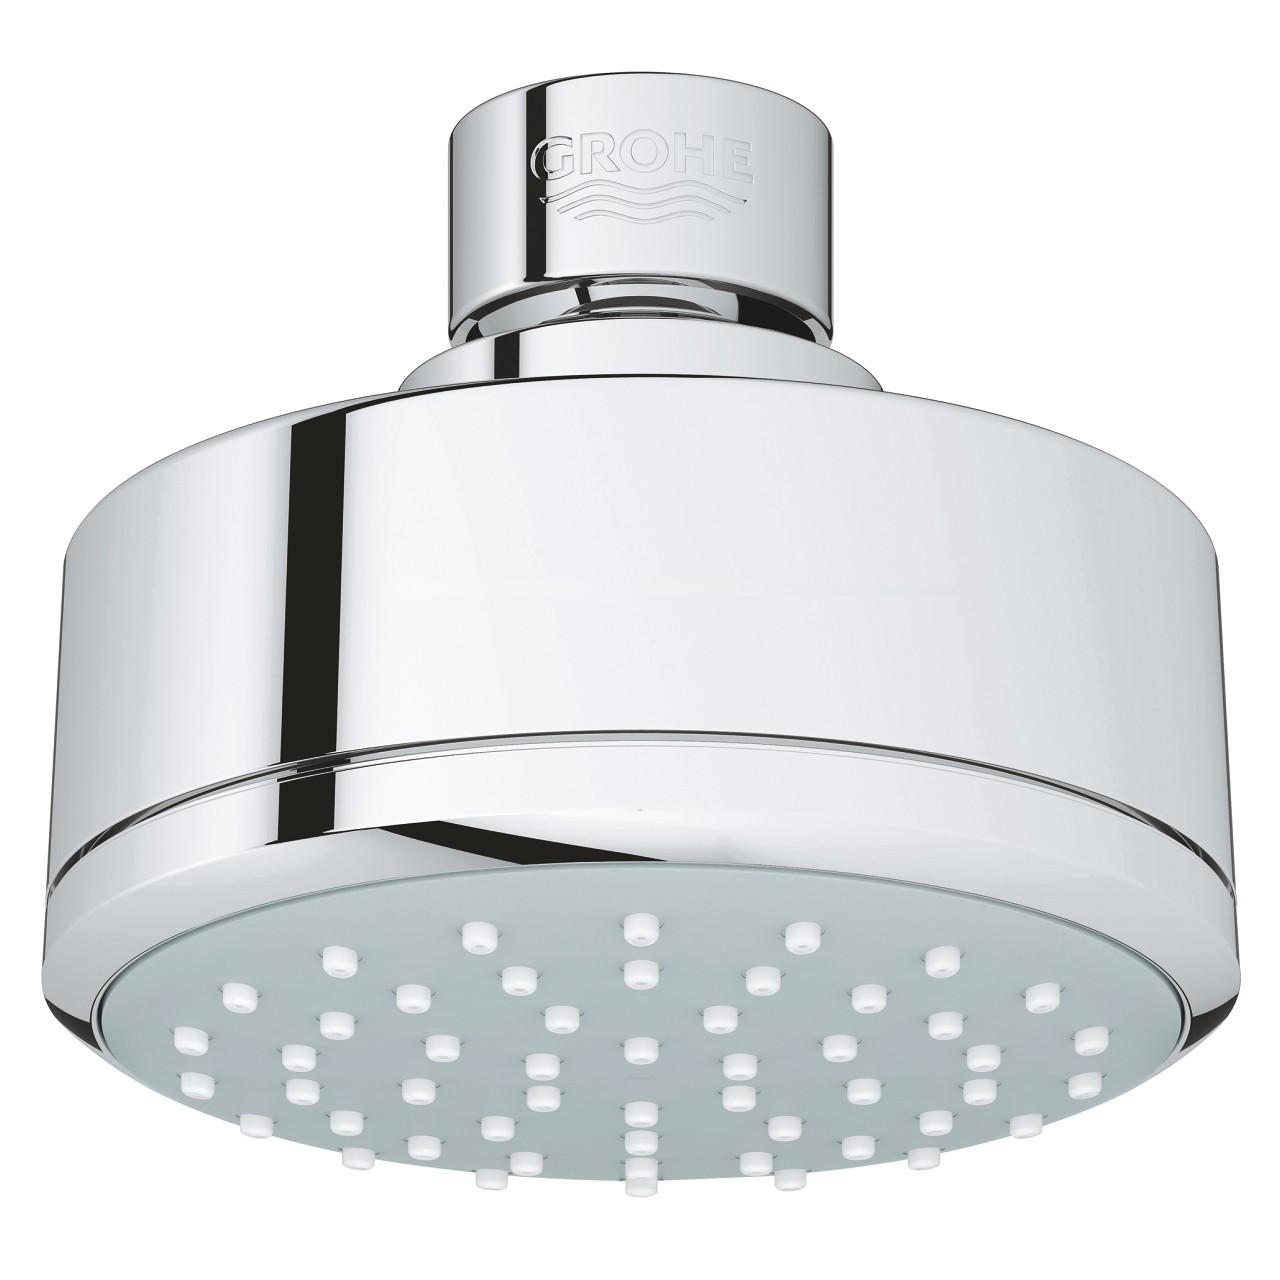 Grohe 26366000 Head Shower Spray Chrome